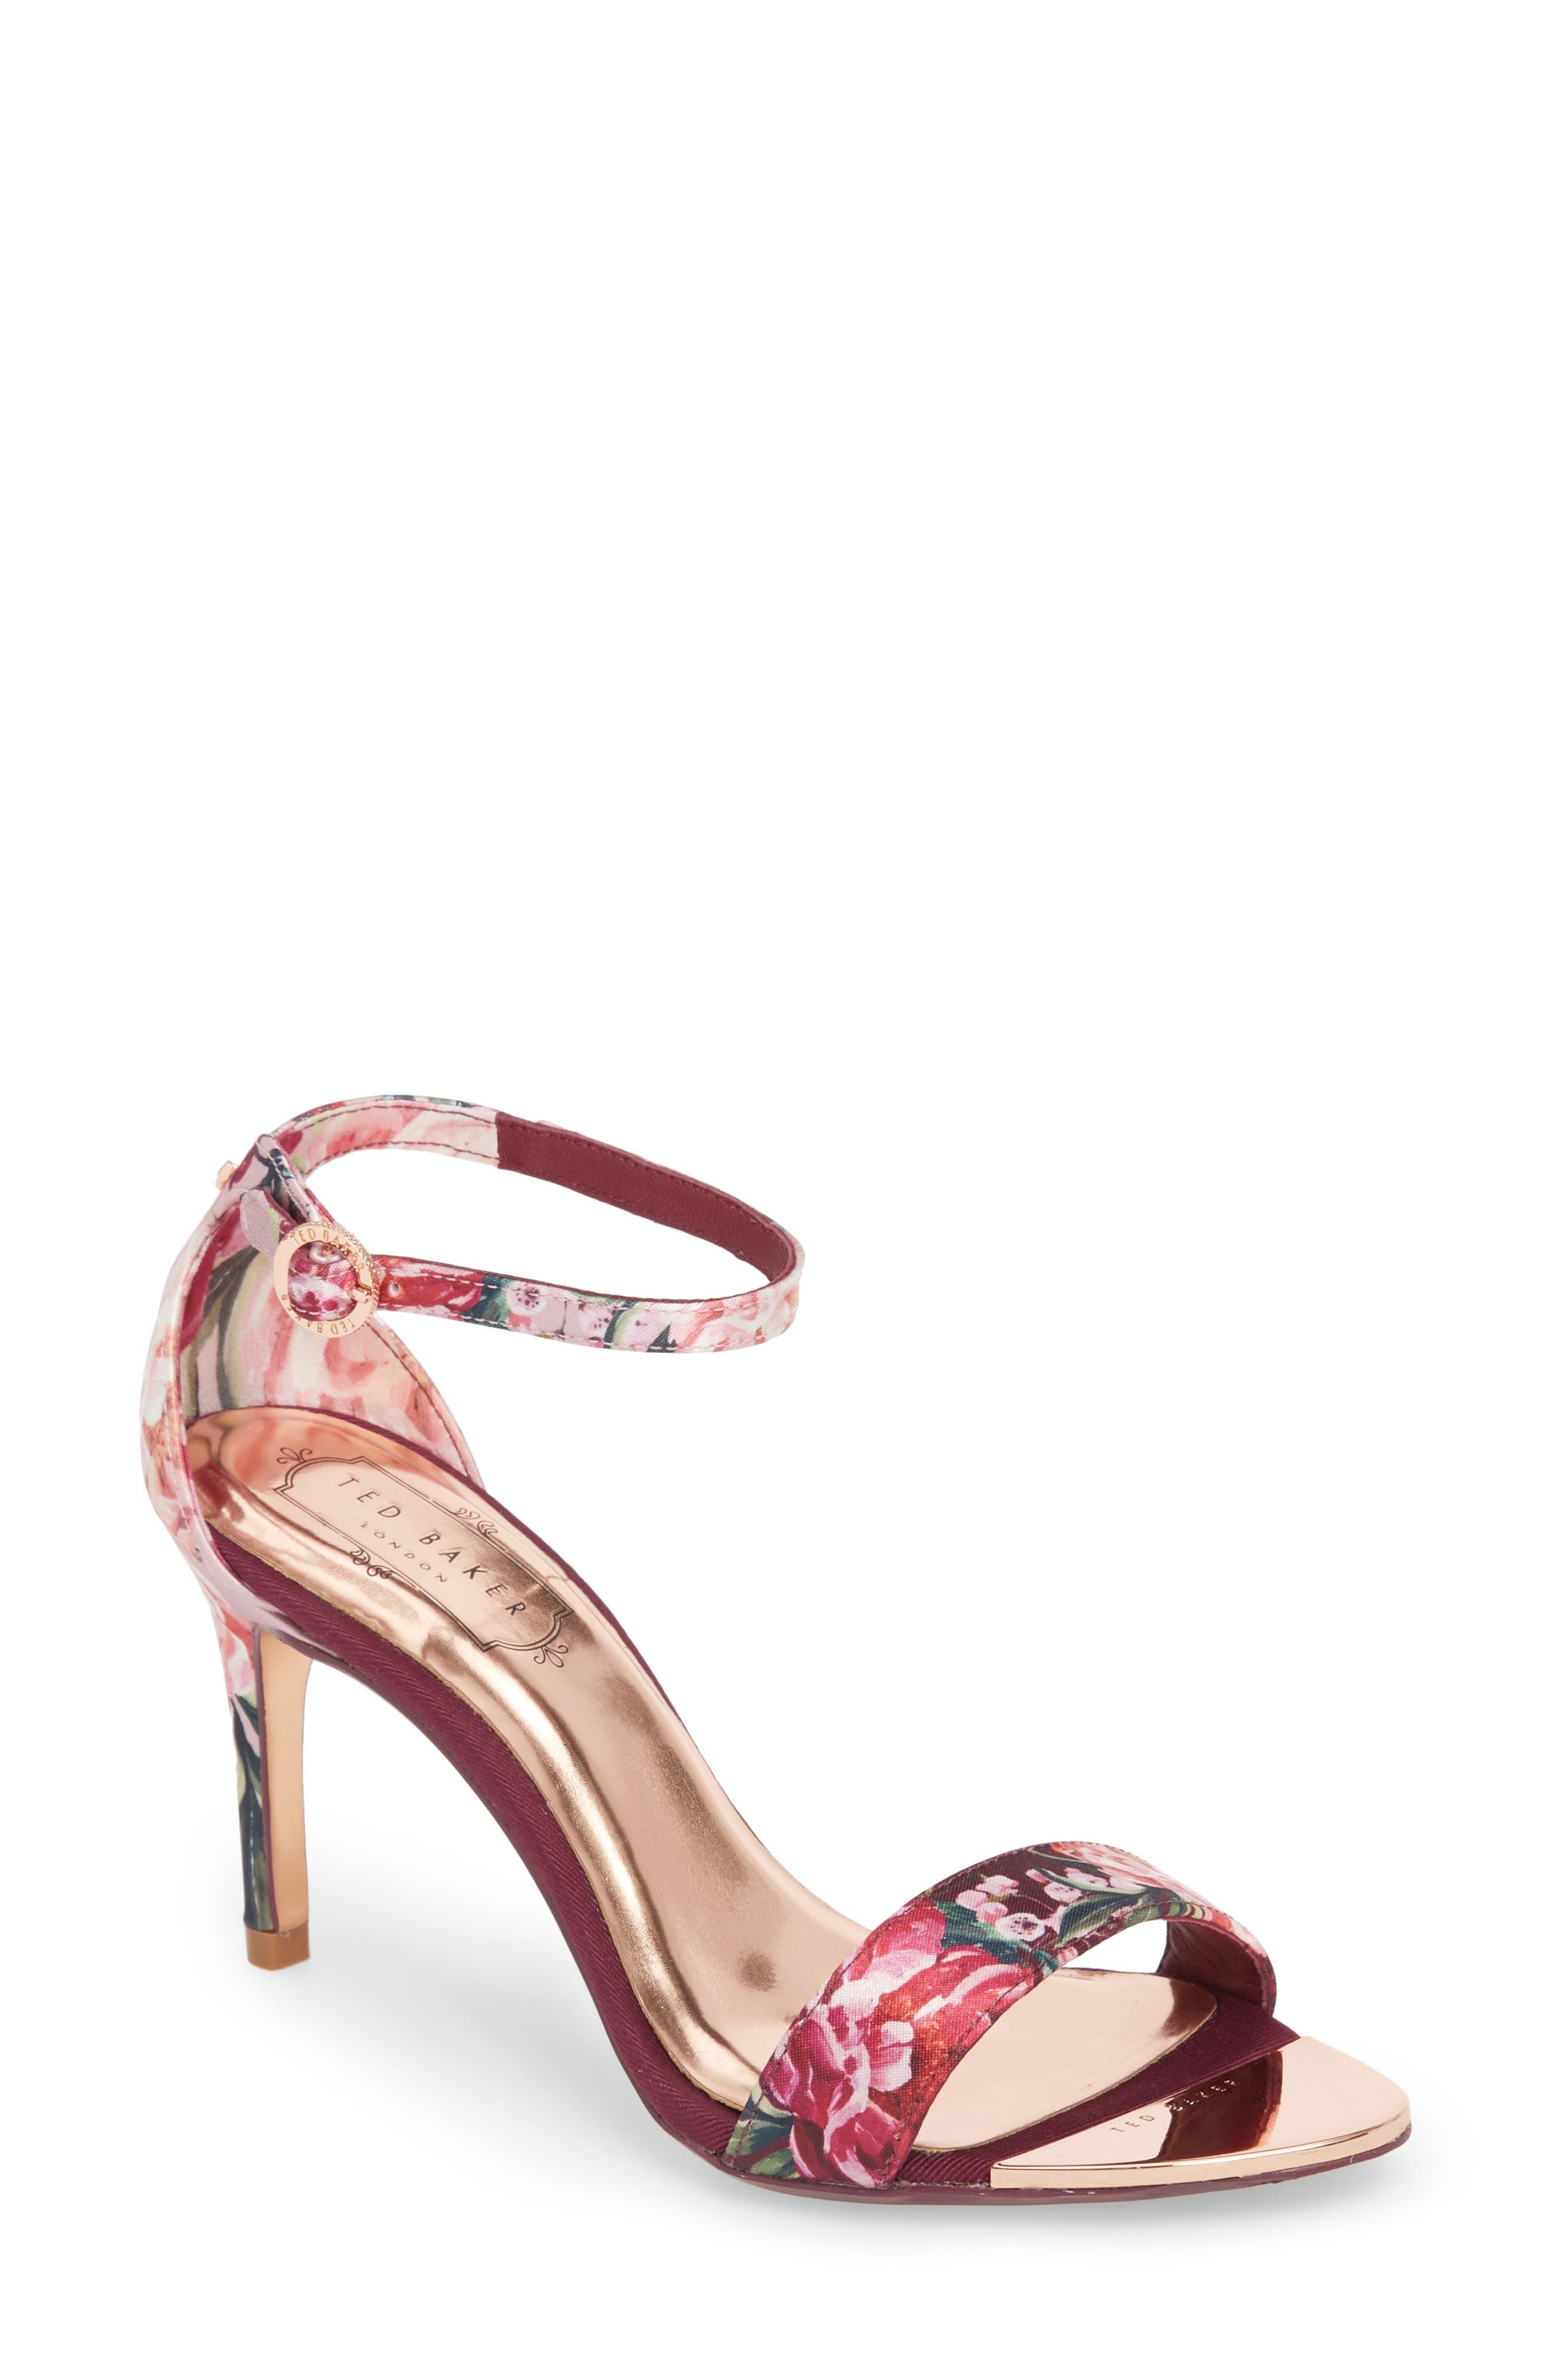 Ted Baker London Mylli Sandal, Pink